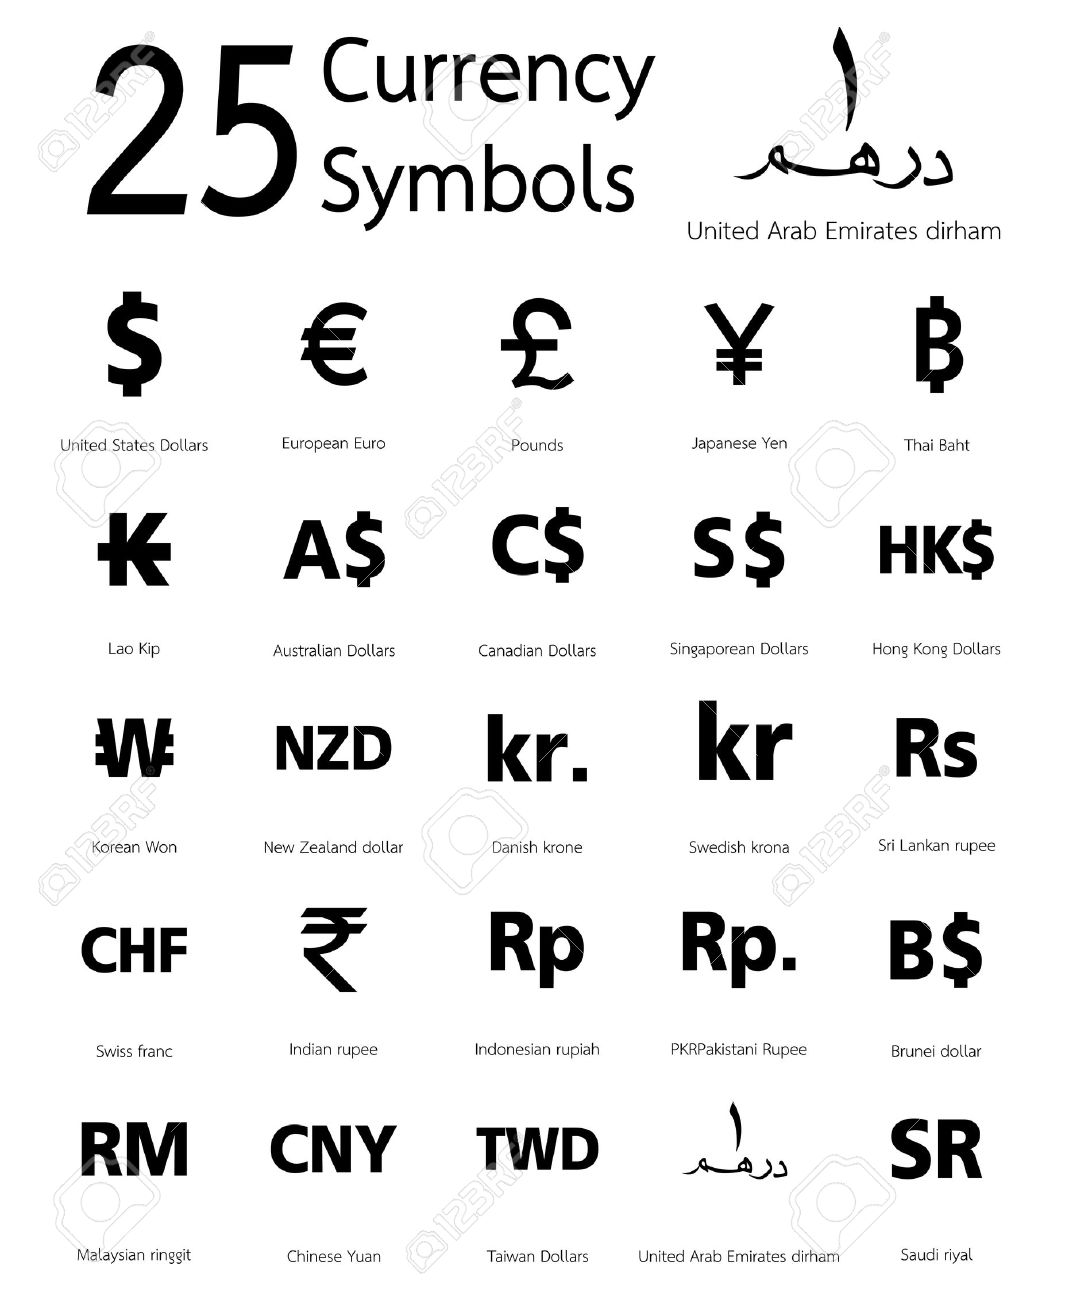 Symbol for krone view symbol biocorpaavc